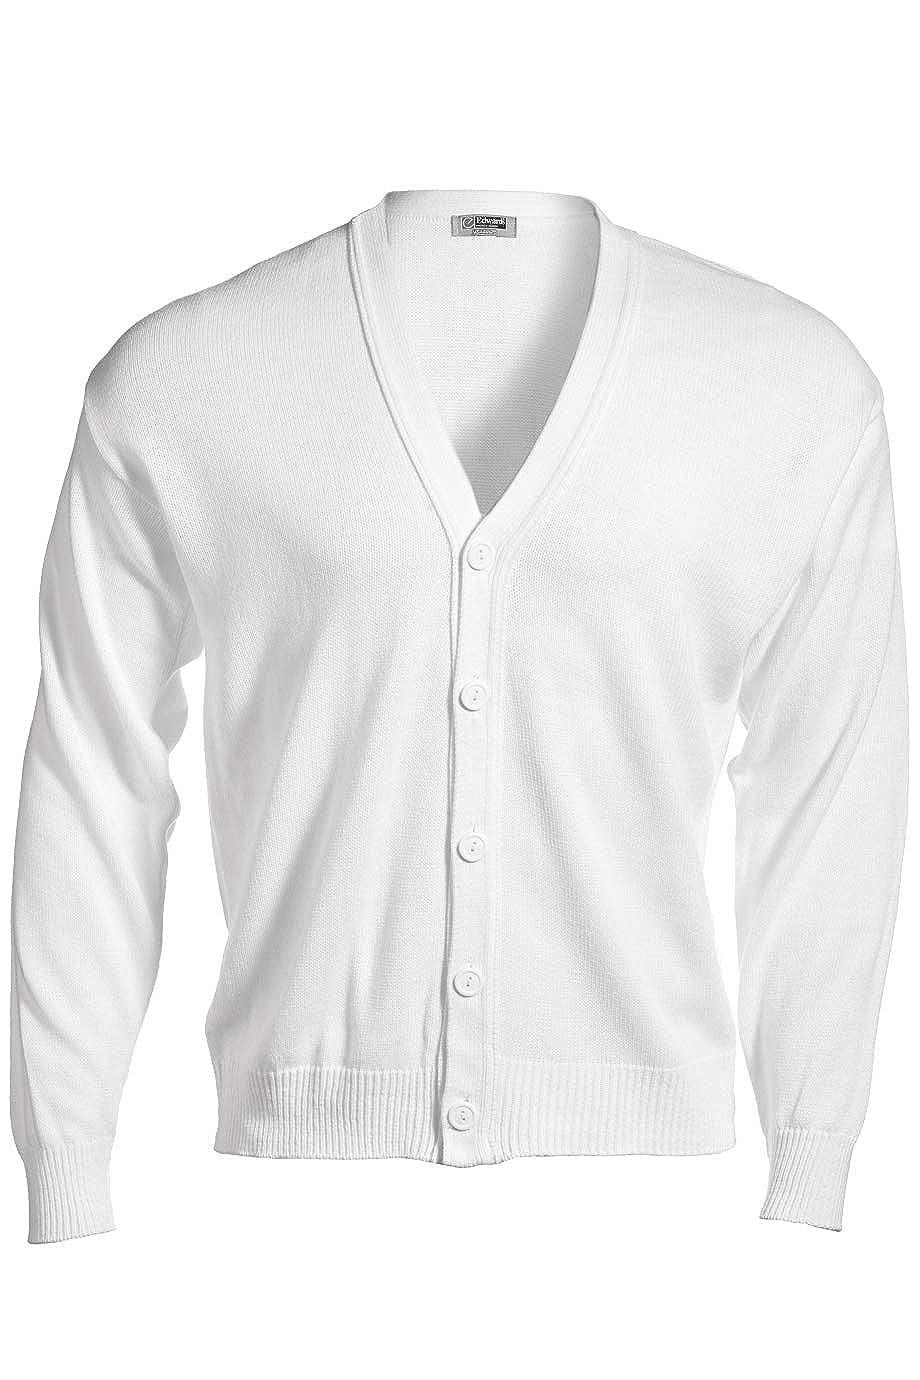 Edwards Garment ED Garments Men s Heavy Duty V-Neck Cardigan at Amazon  Men s Clothing store  cd9af4f5d